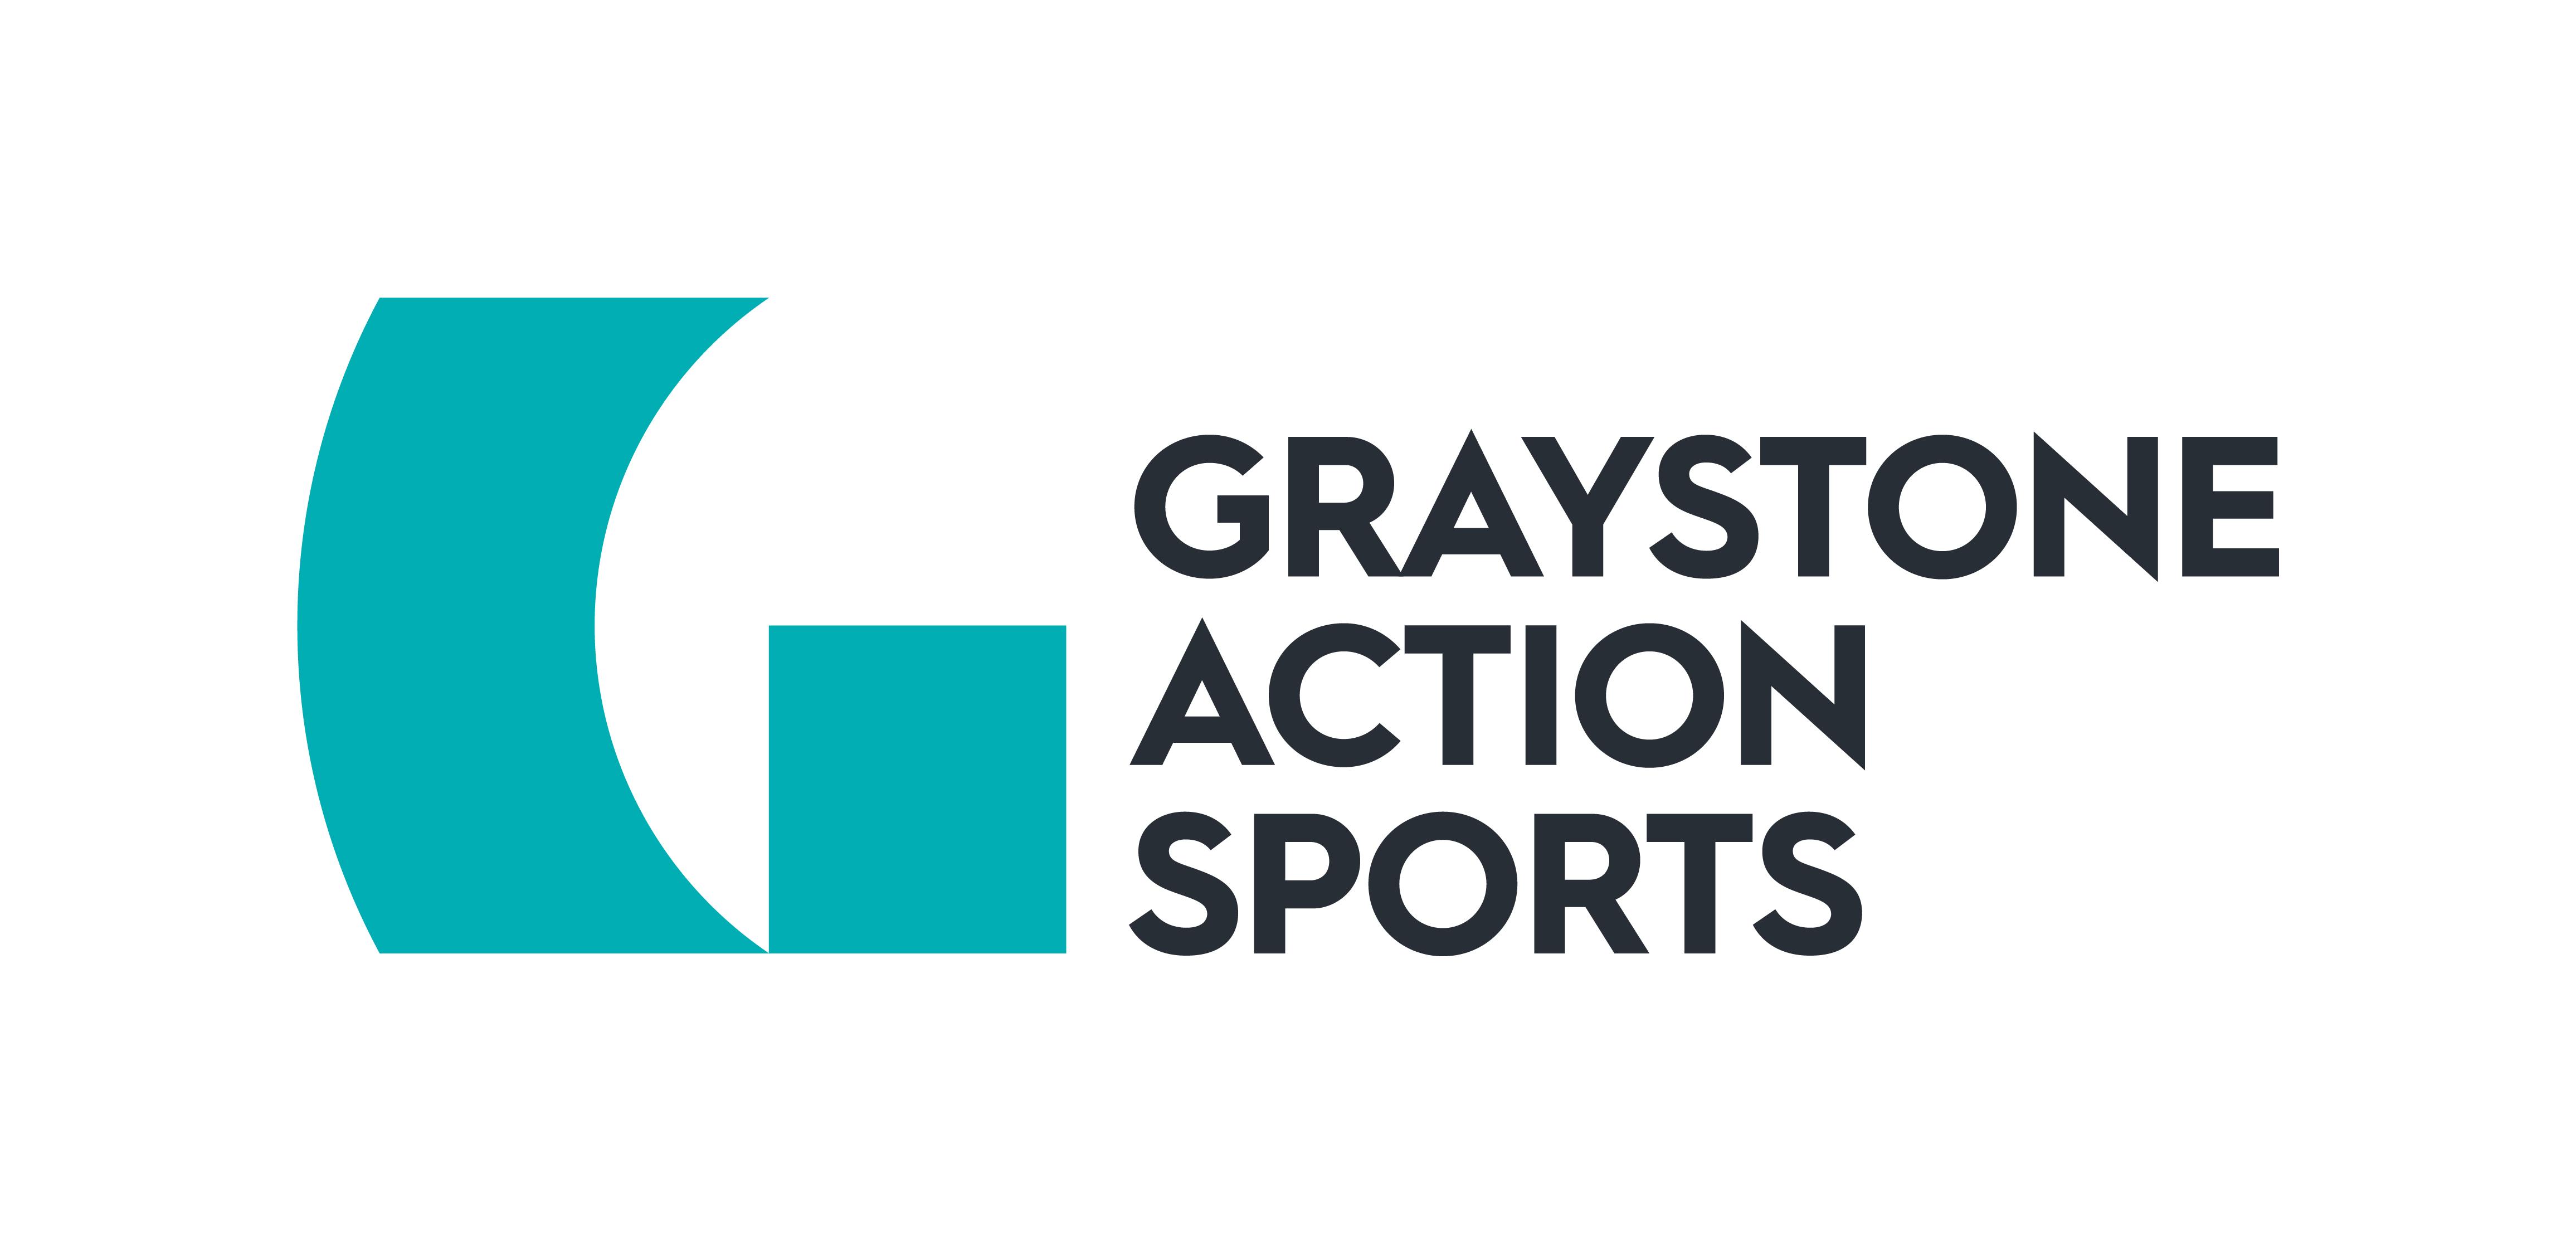 Graystone Action Sports Logo